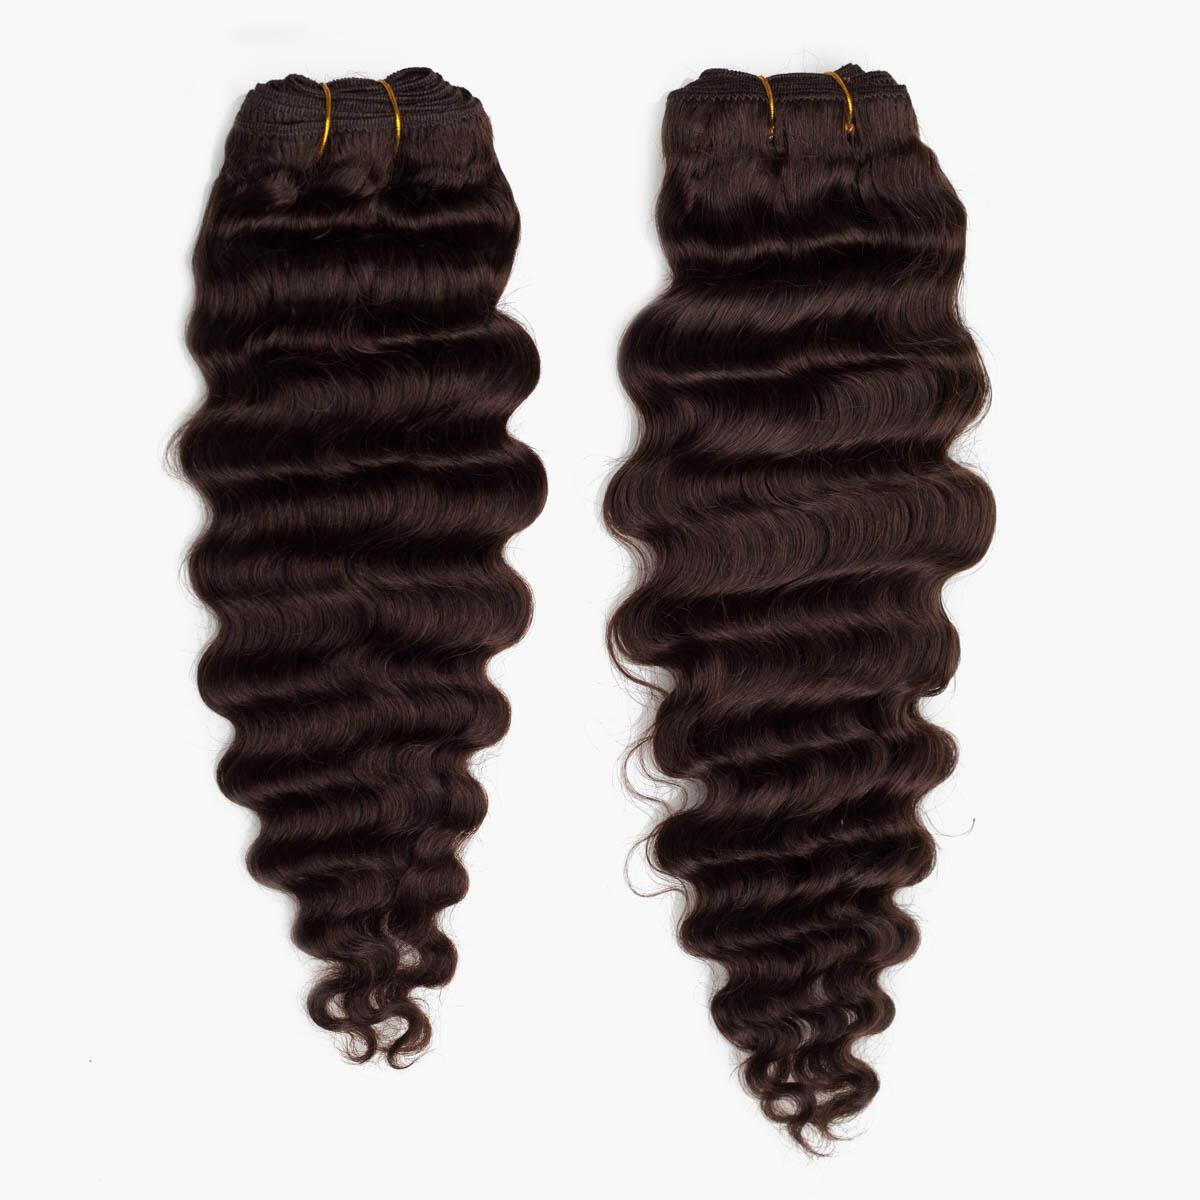 Hair Weft Soft Wave 2.2 Coffee Brown 45 cm